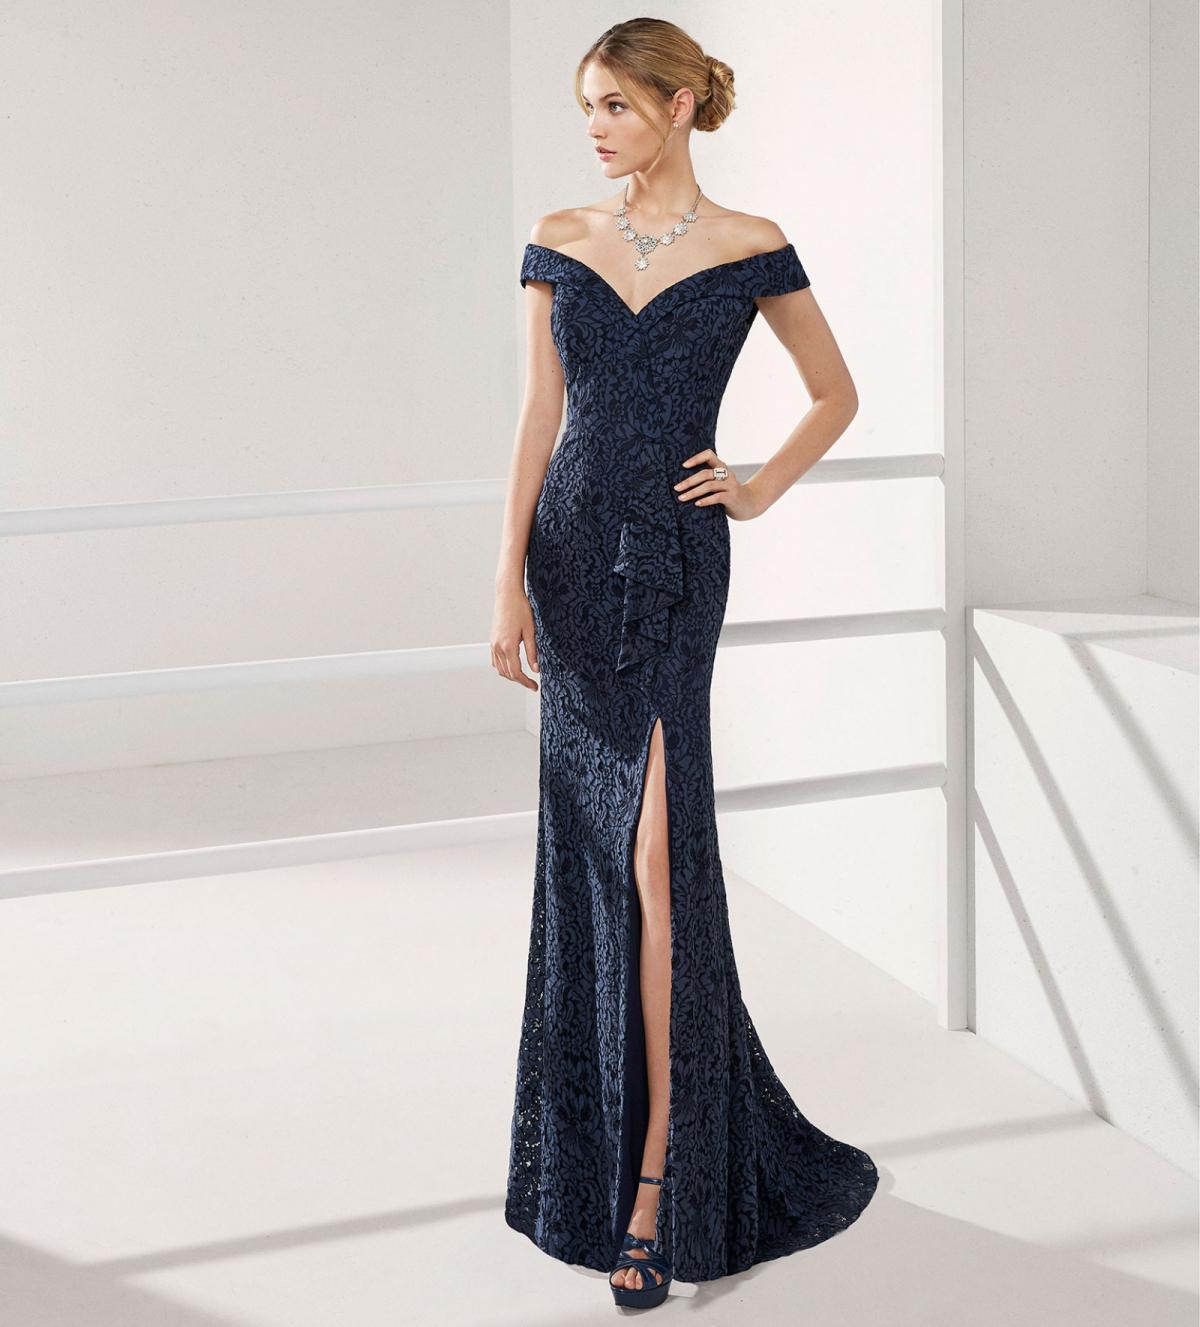 Para La Vestidos Invitada Perfecta BodasSé m80wvNn